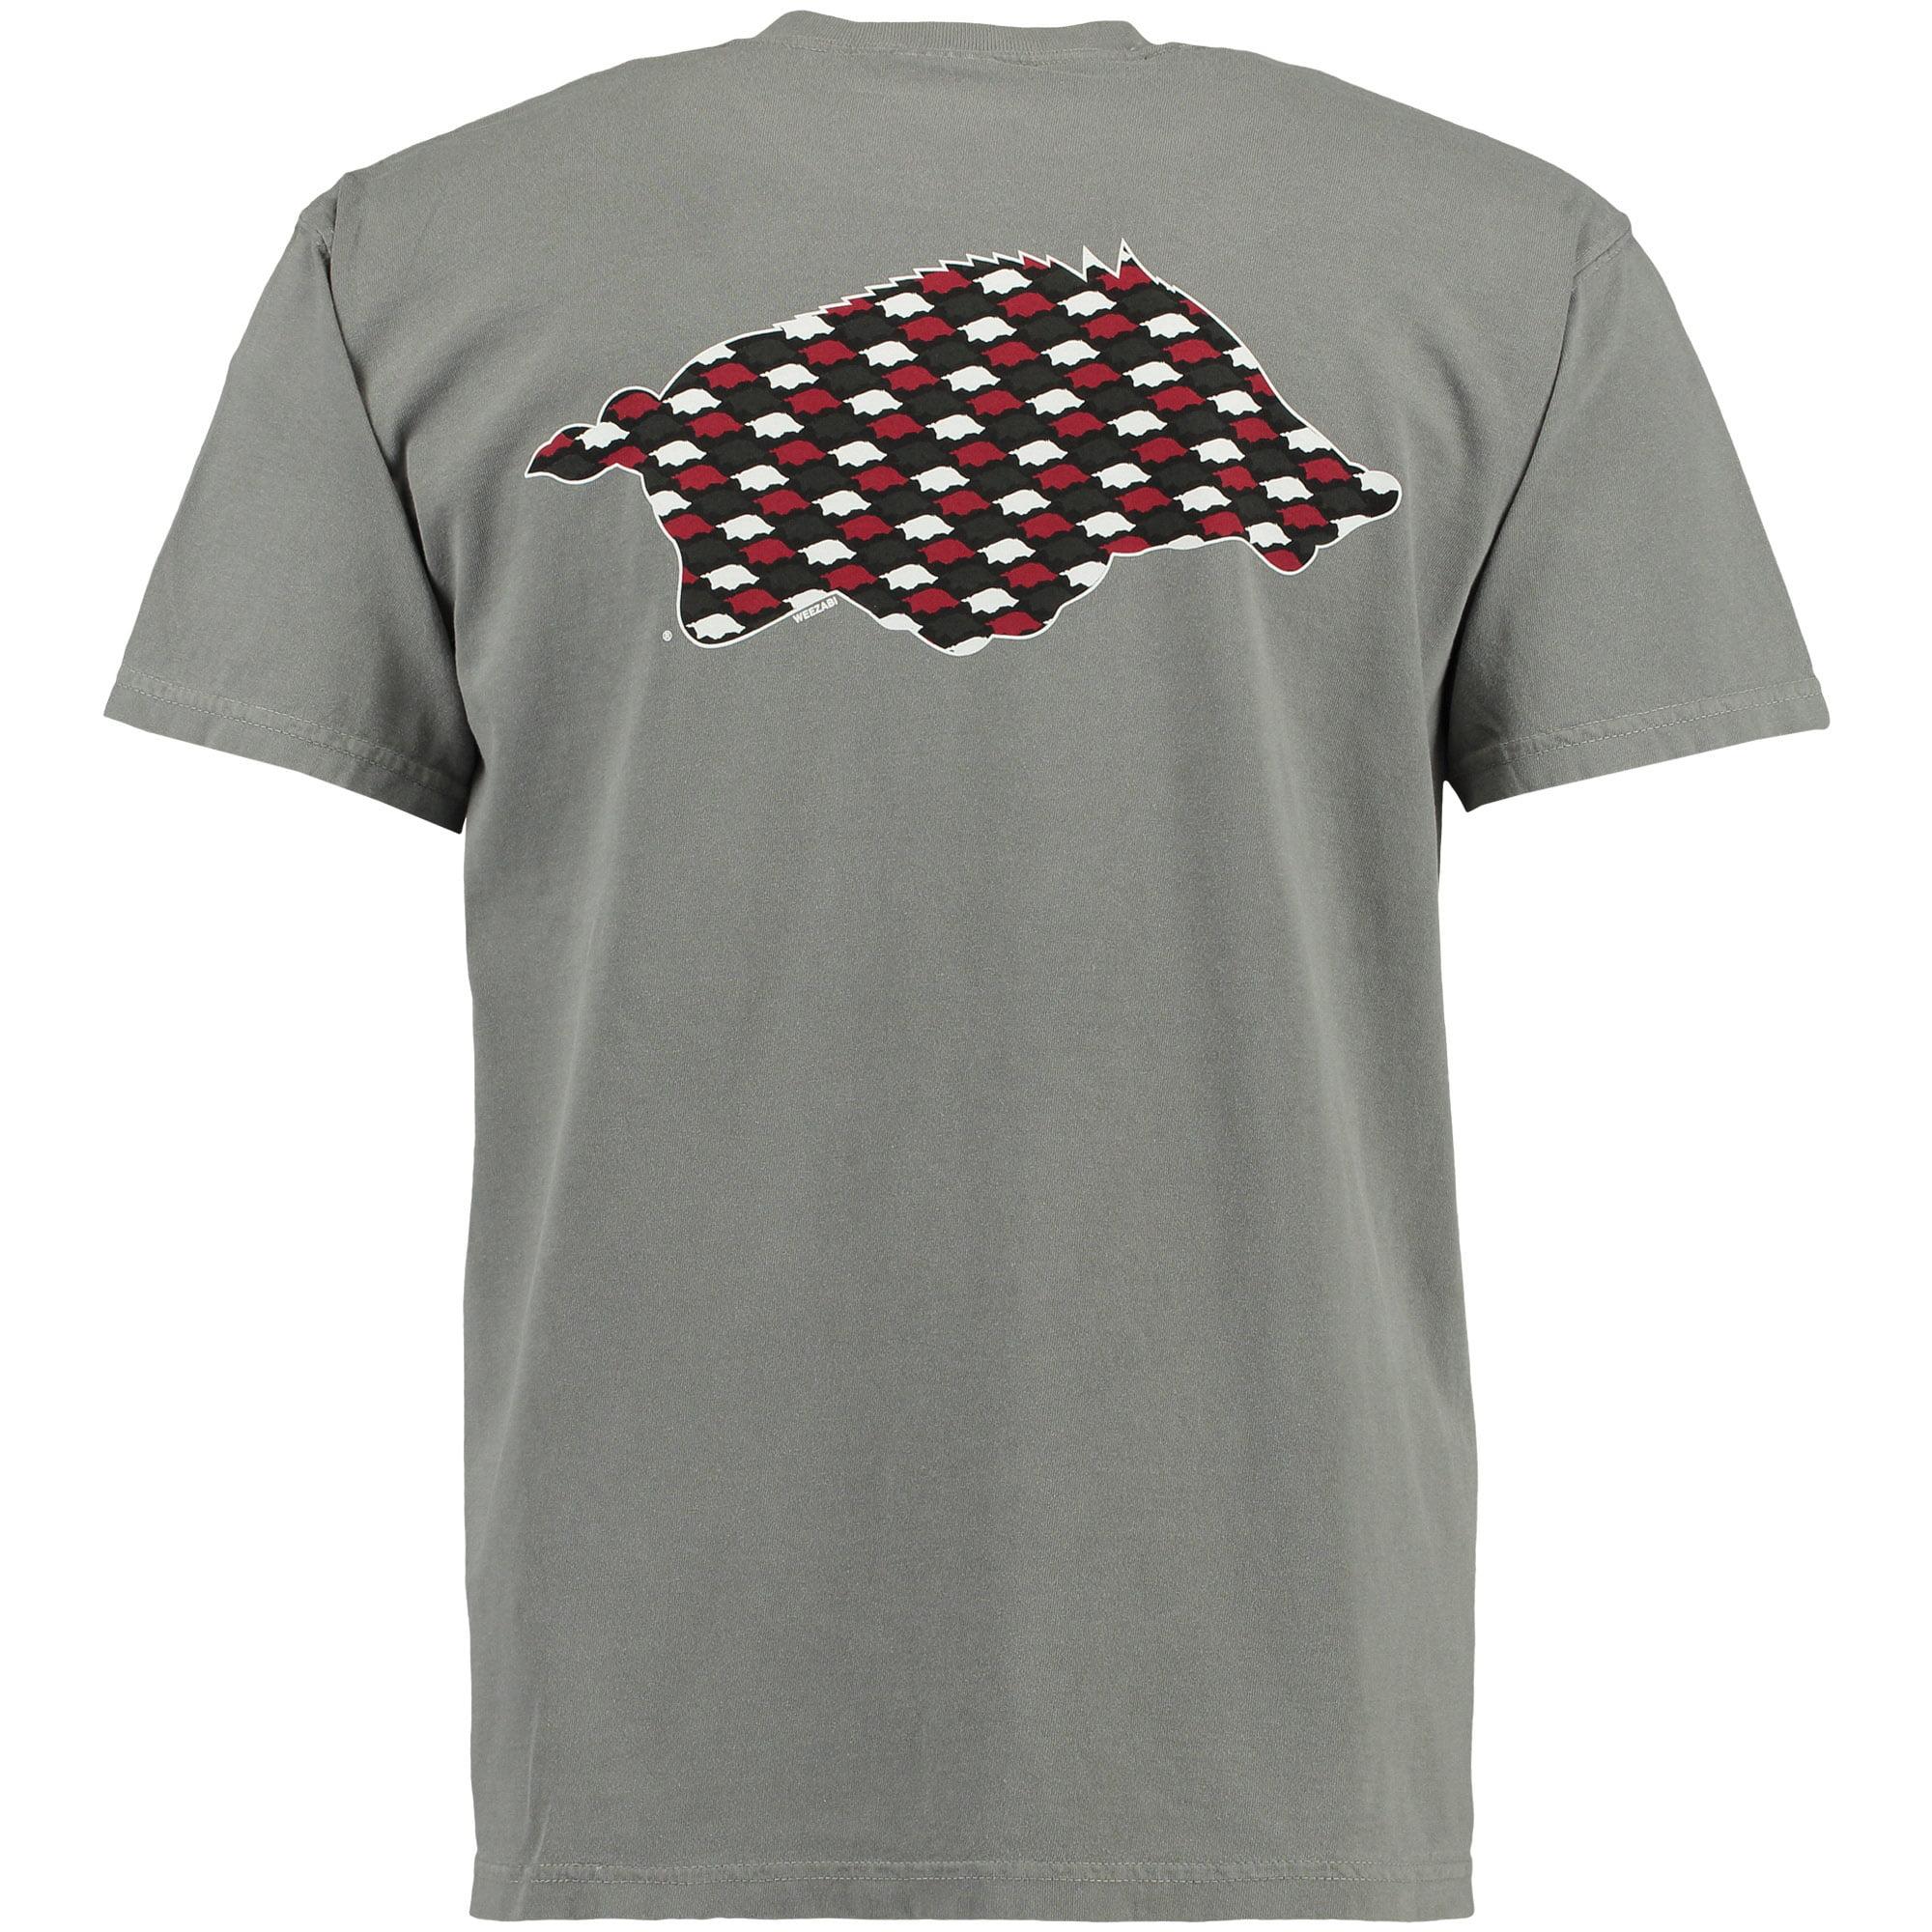 Razorbacks Custom Personalized Name /& Number Infant or Toddler T-shirt